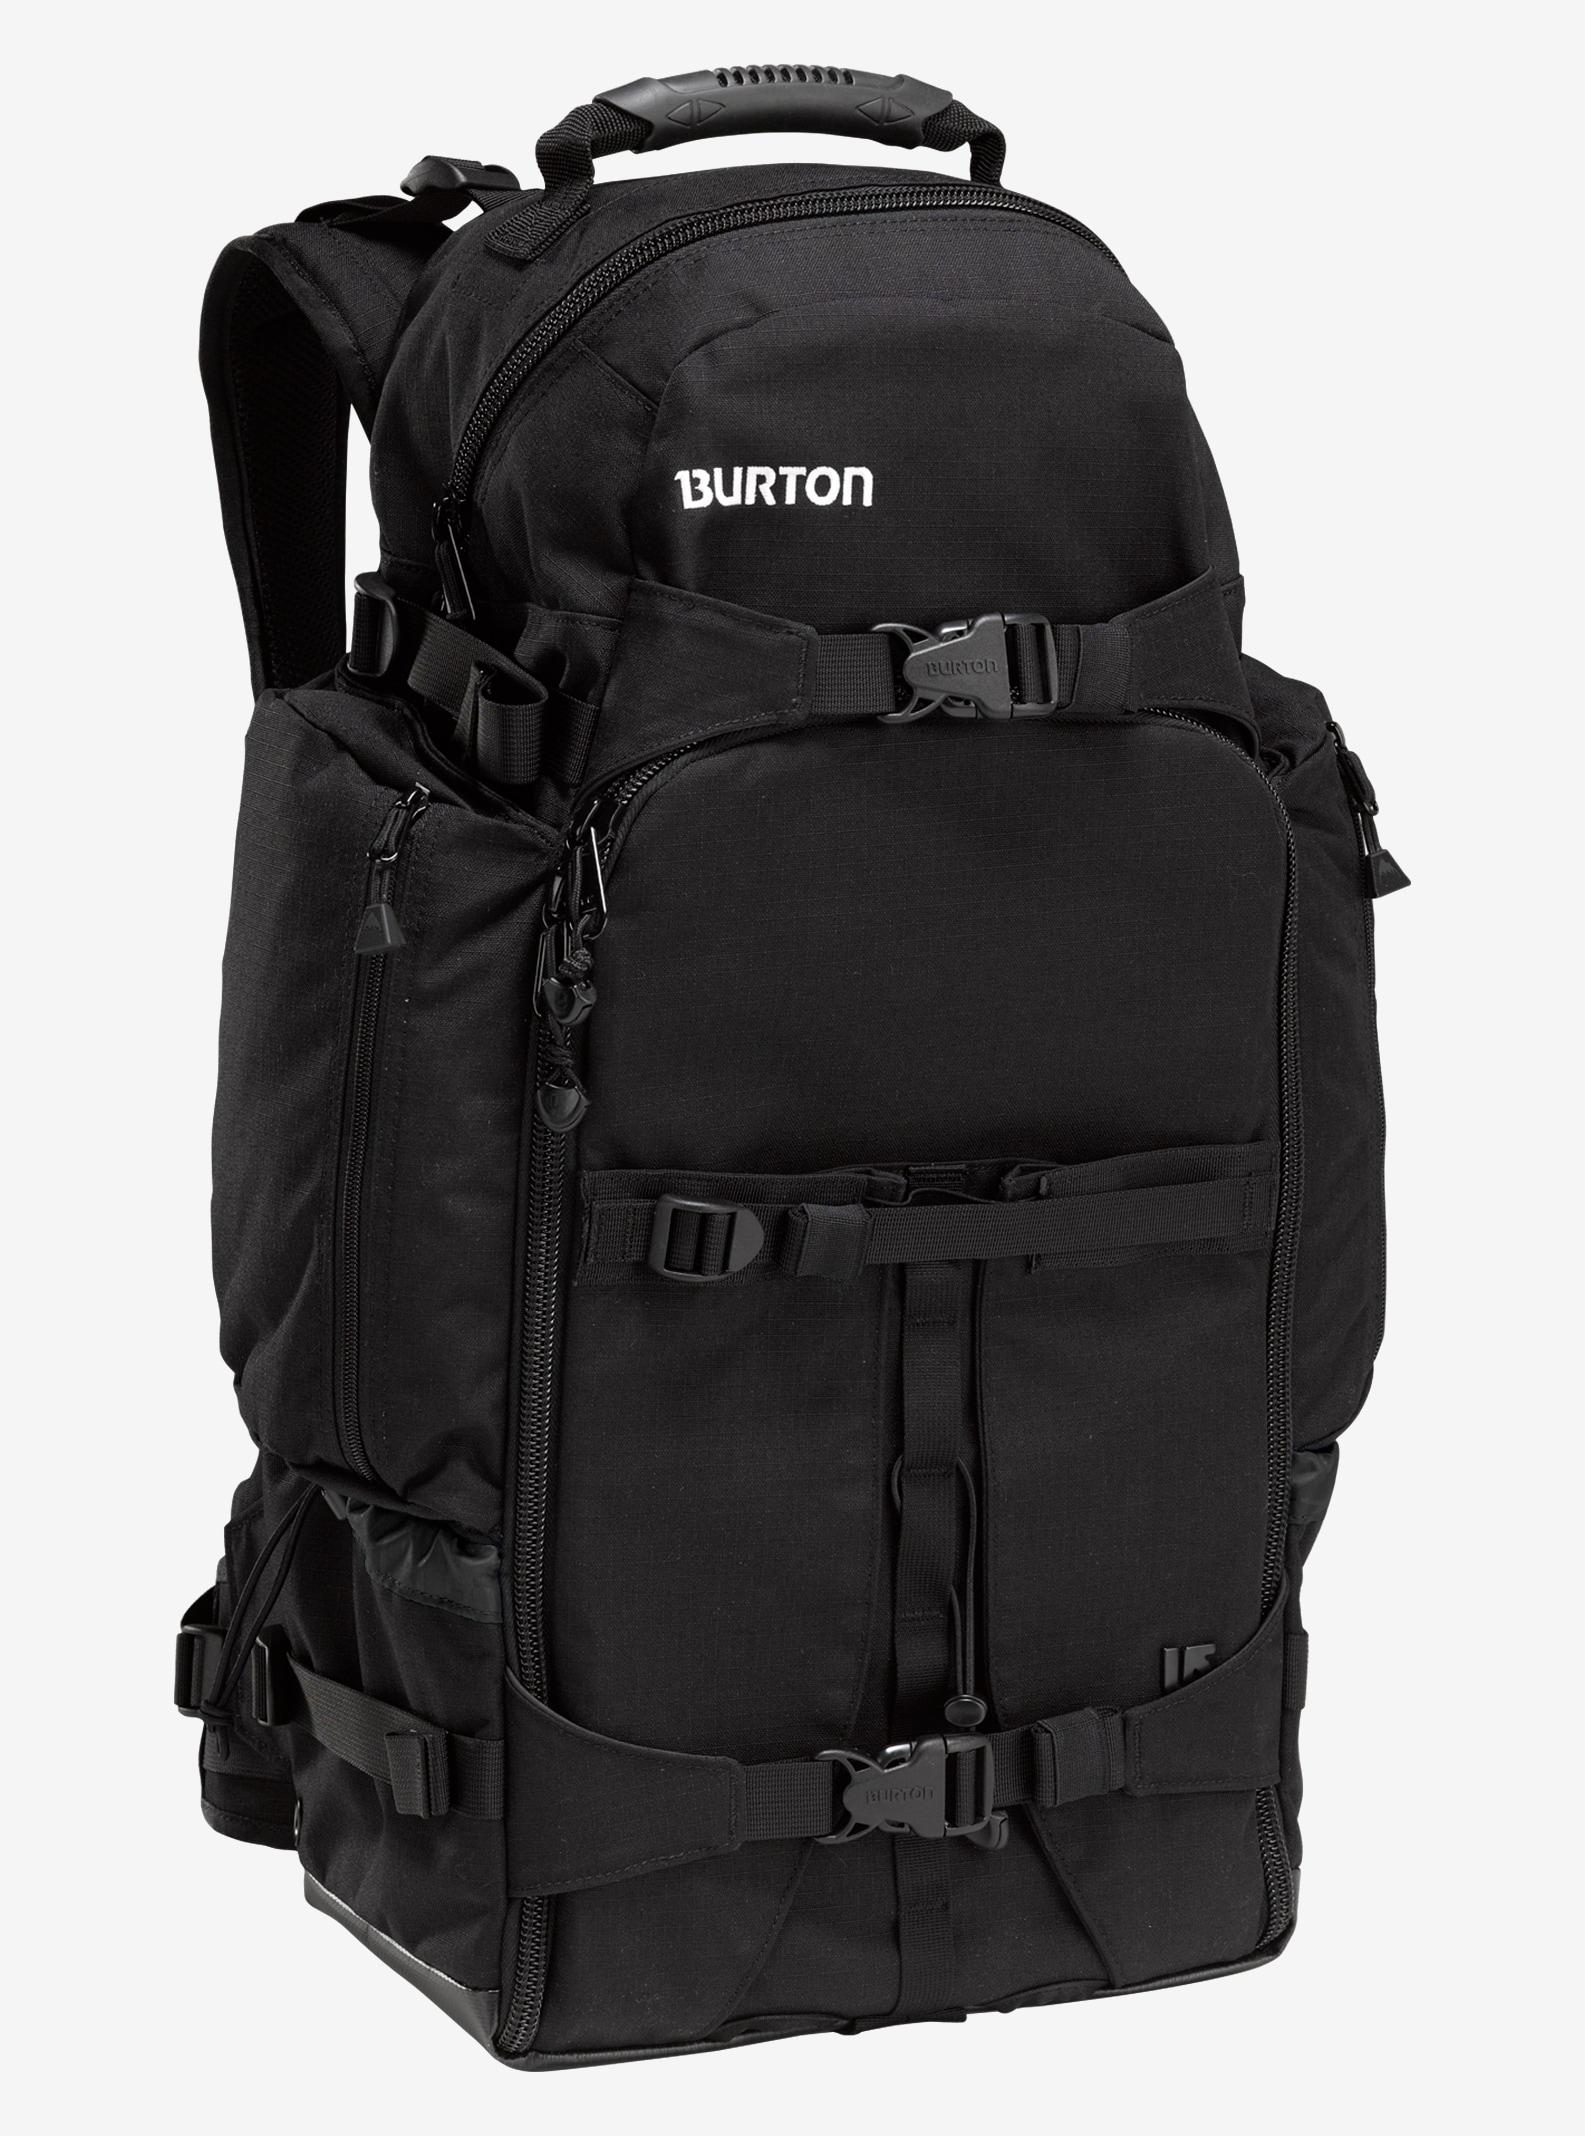 Burton F-Stop 28L Camera Backpack shown in True Black